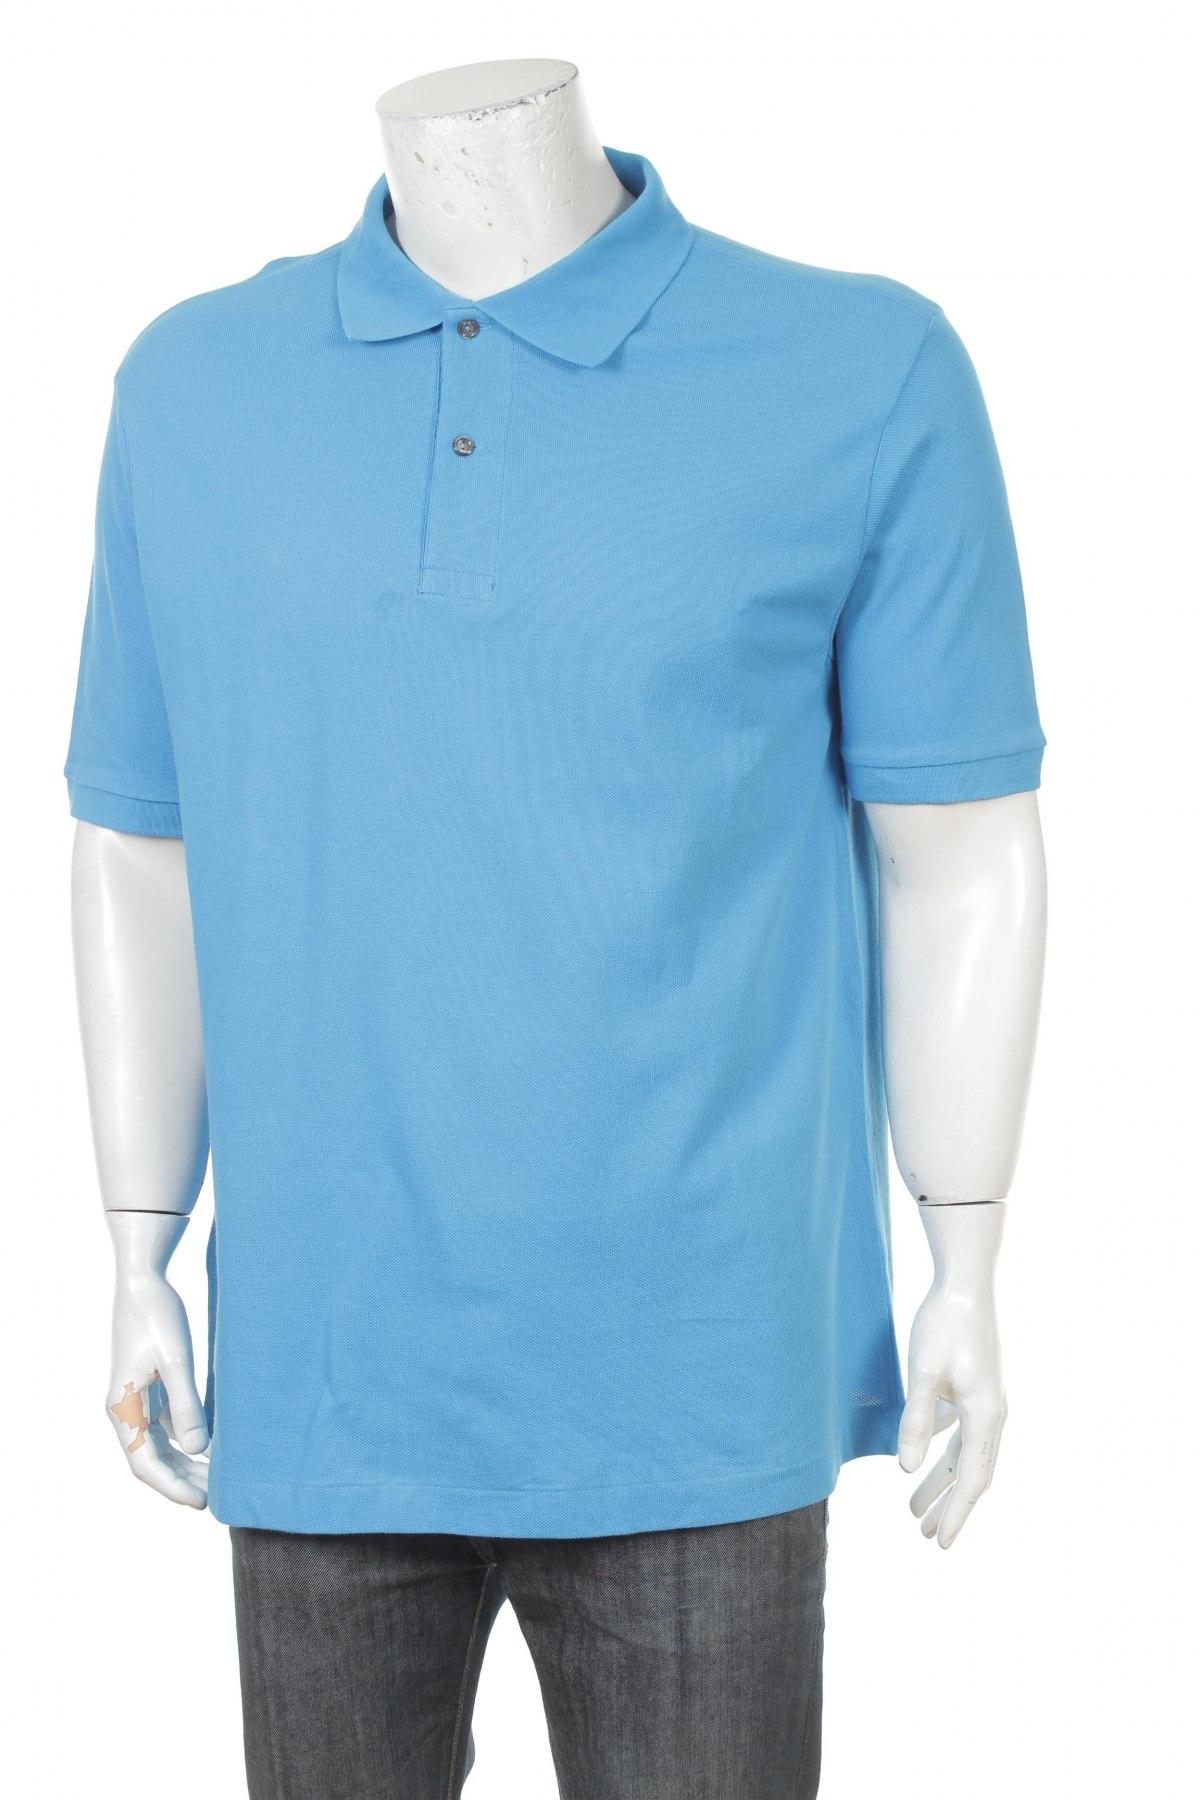 7bb7130d6d79 Ανδρικό t-shirt Lacoste - σε συμφέρουσα τιμή στο Remix -  100201678